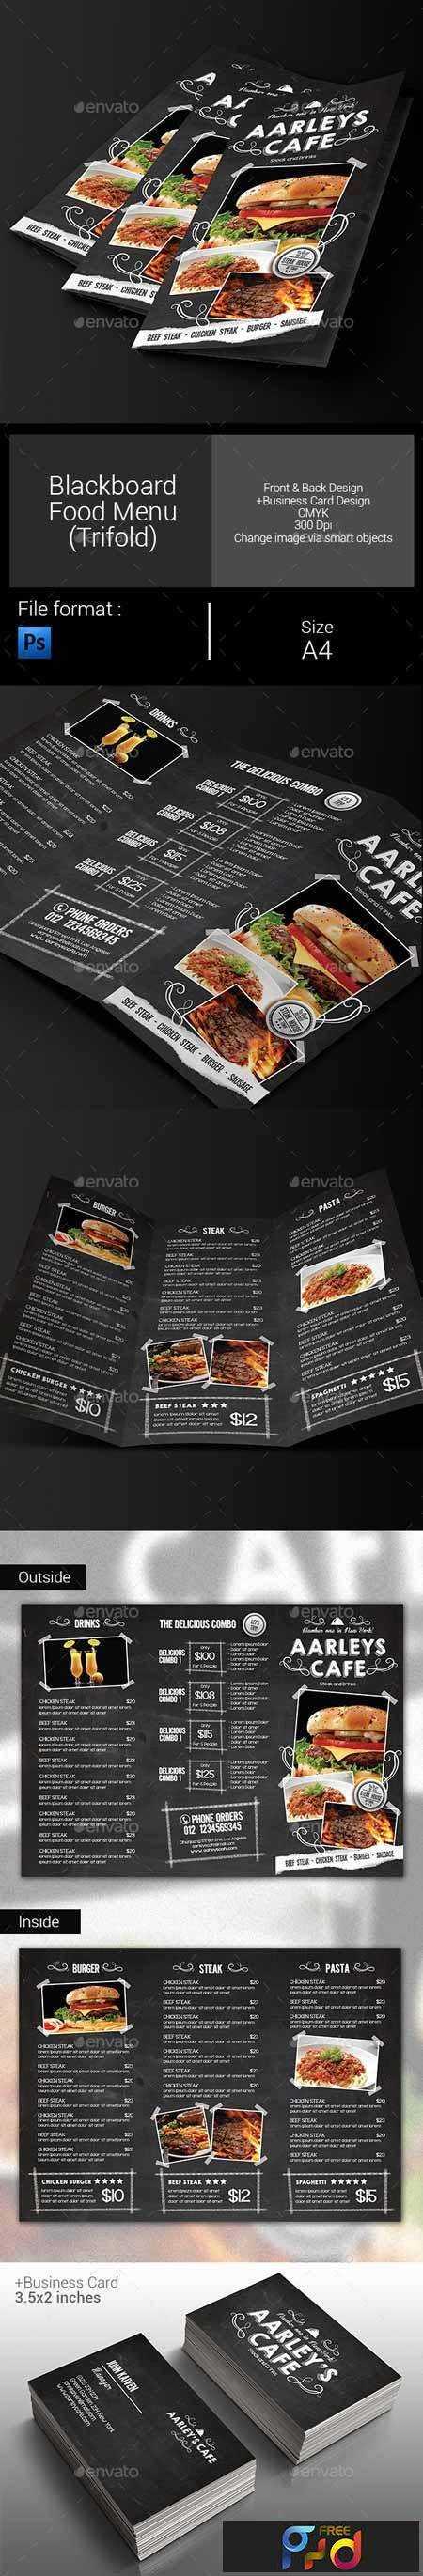 freepsdvn-com_1432662463_blackboard-food-menu-trifold-business-card-9897895